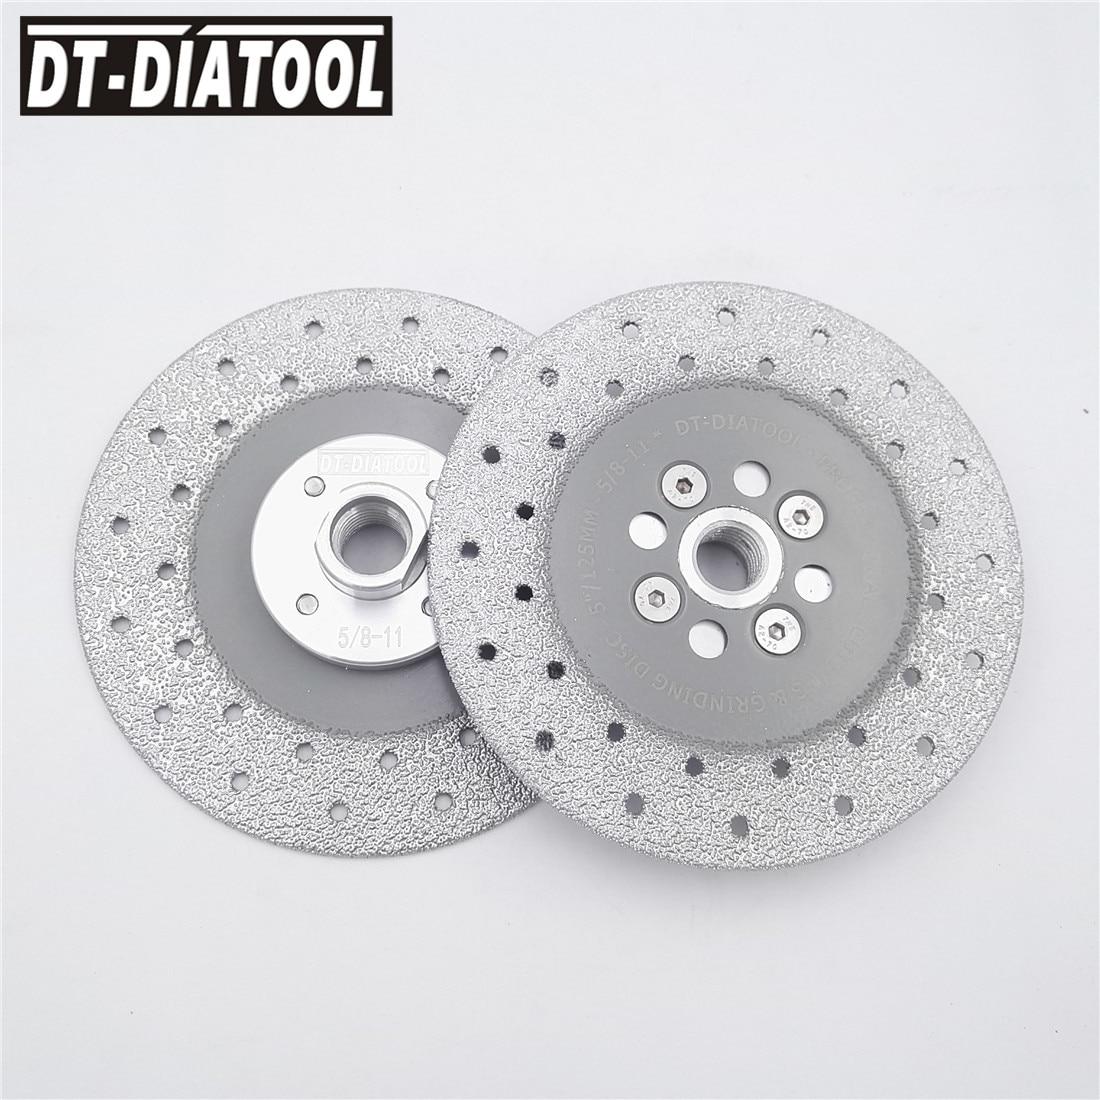 2pcs/units 5 Double Sided Vacuum Brazed Diamond Cutting wheel Grinding Disc 5/8-11 Flange Diameter 125MM for Shaping stone кольцо lsm 8 14